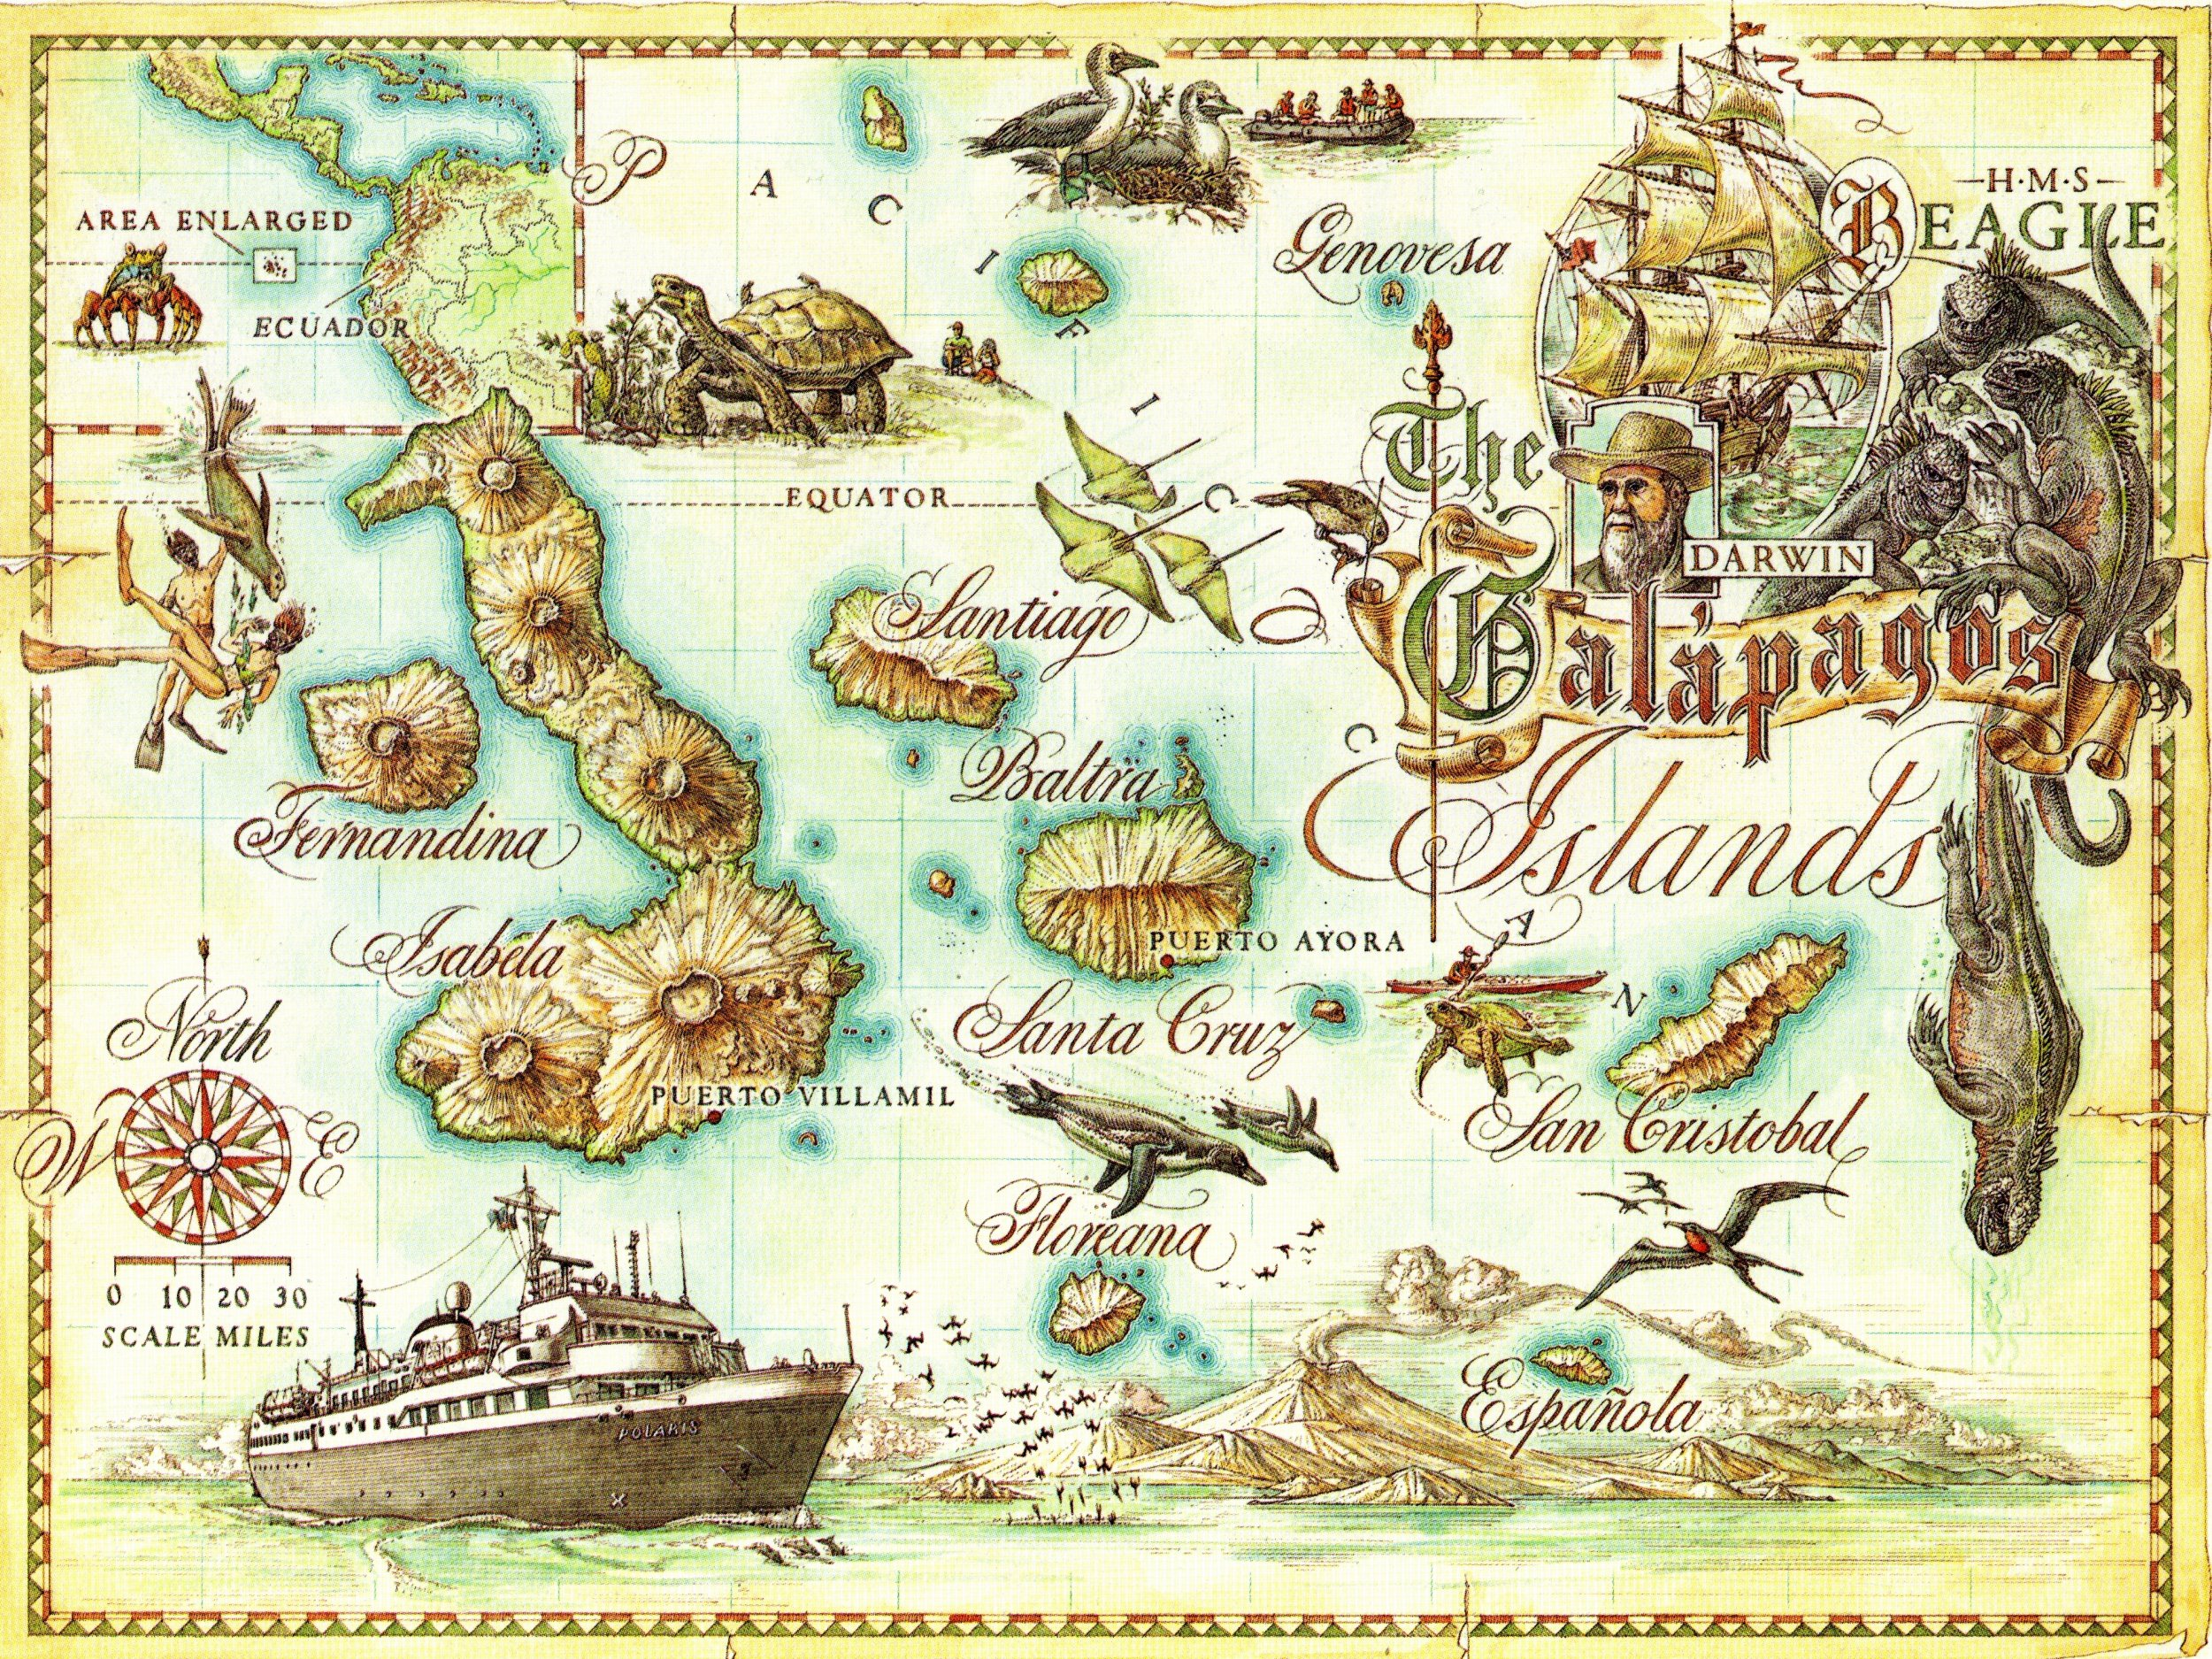 Galapagos Islands Map Galapagos Islands Mappery - Galapagos map